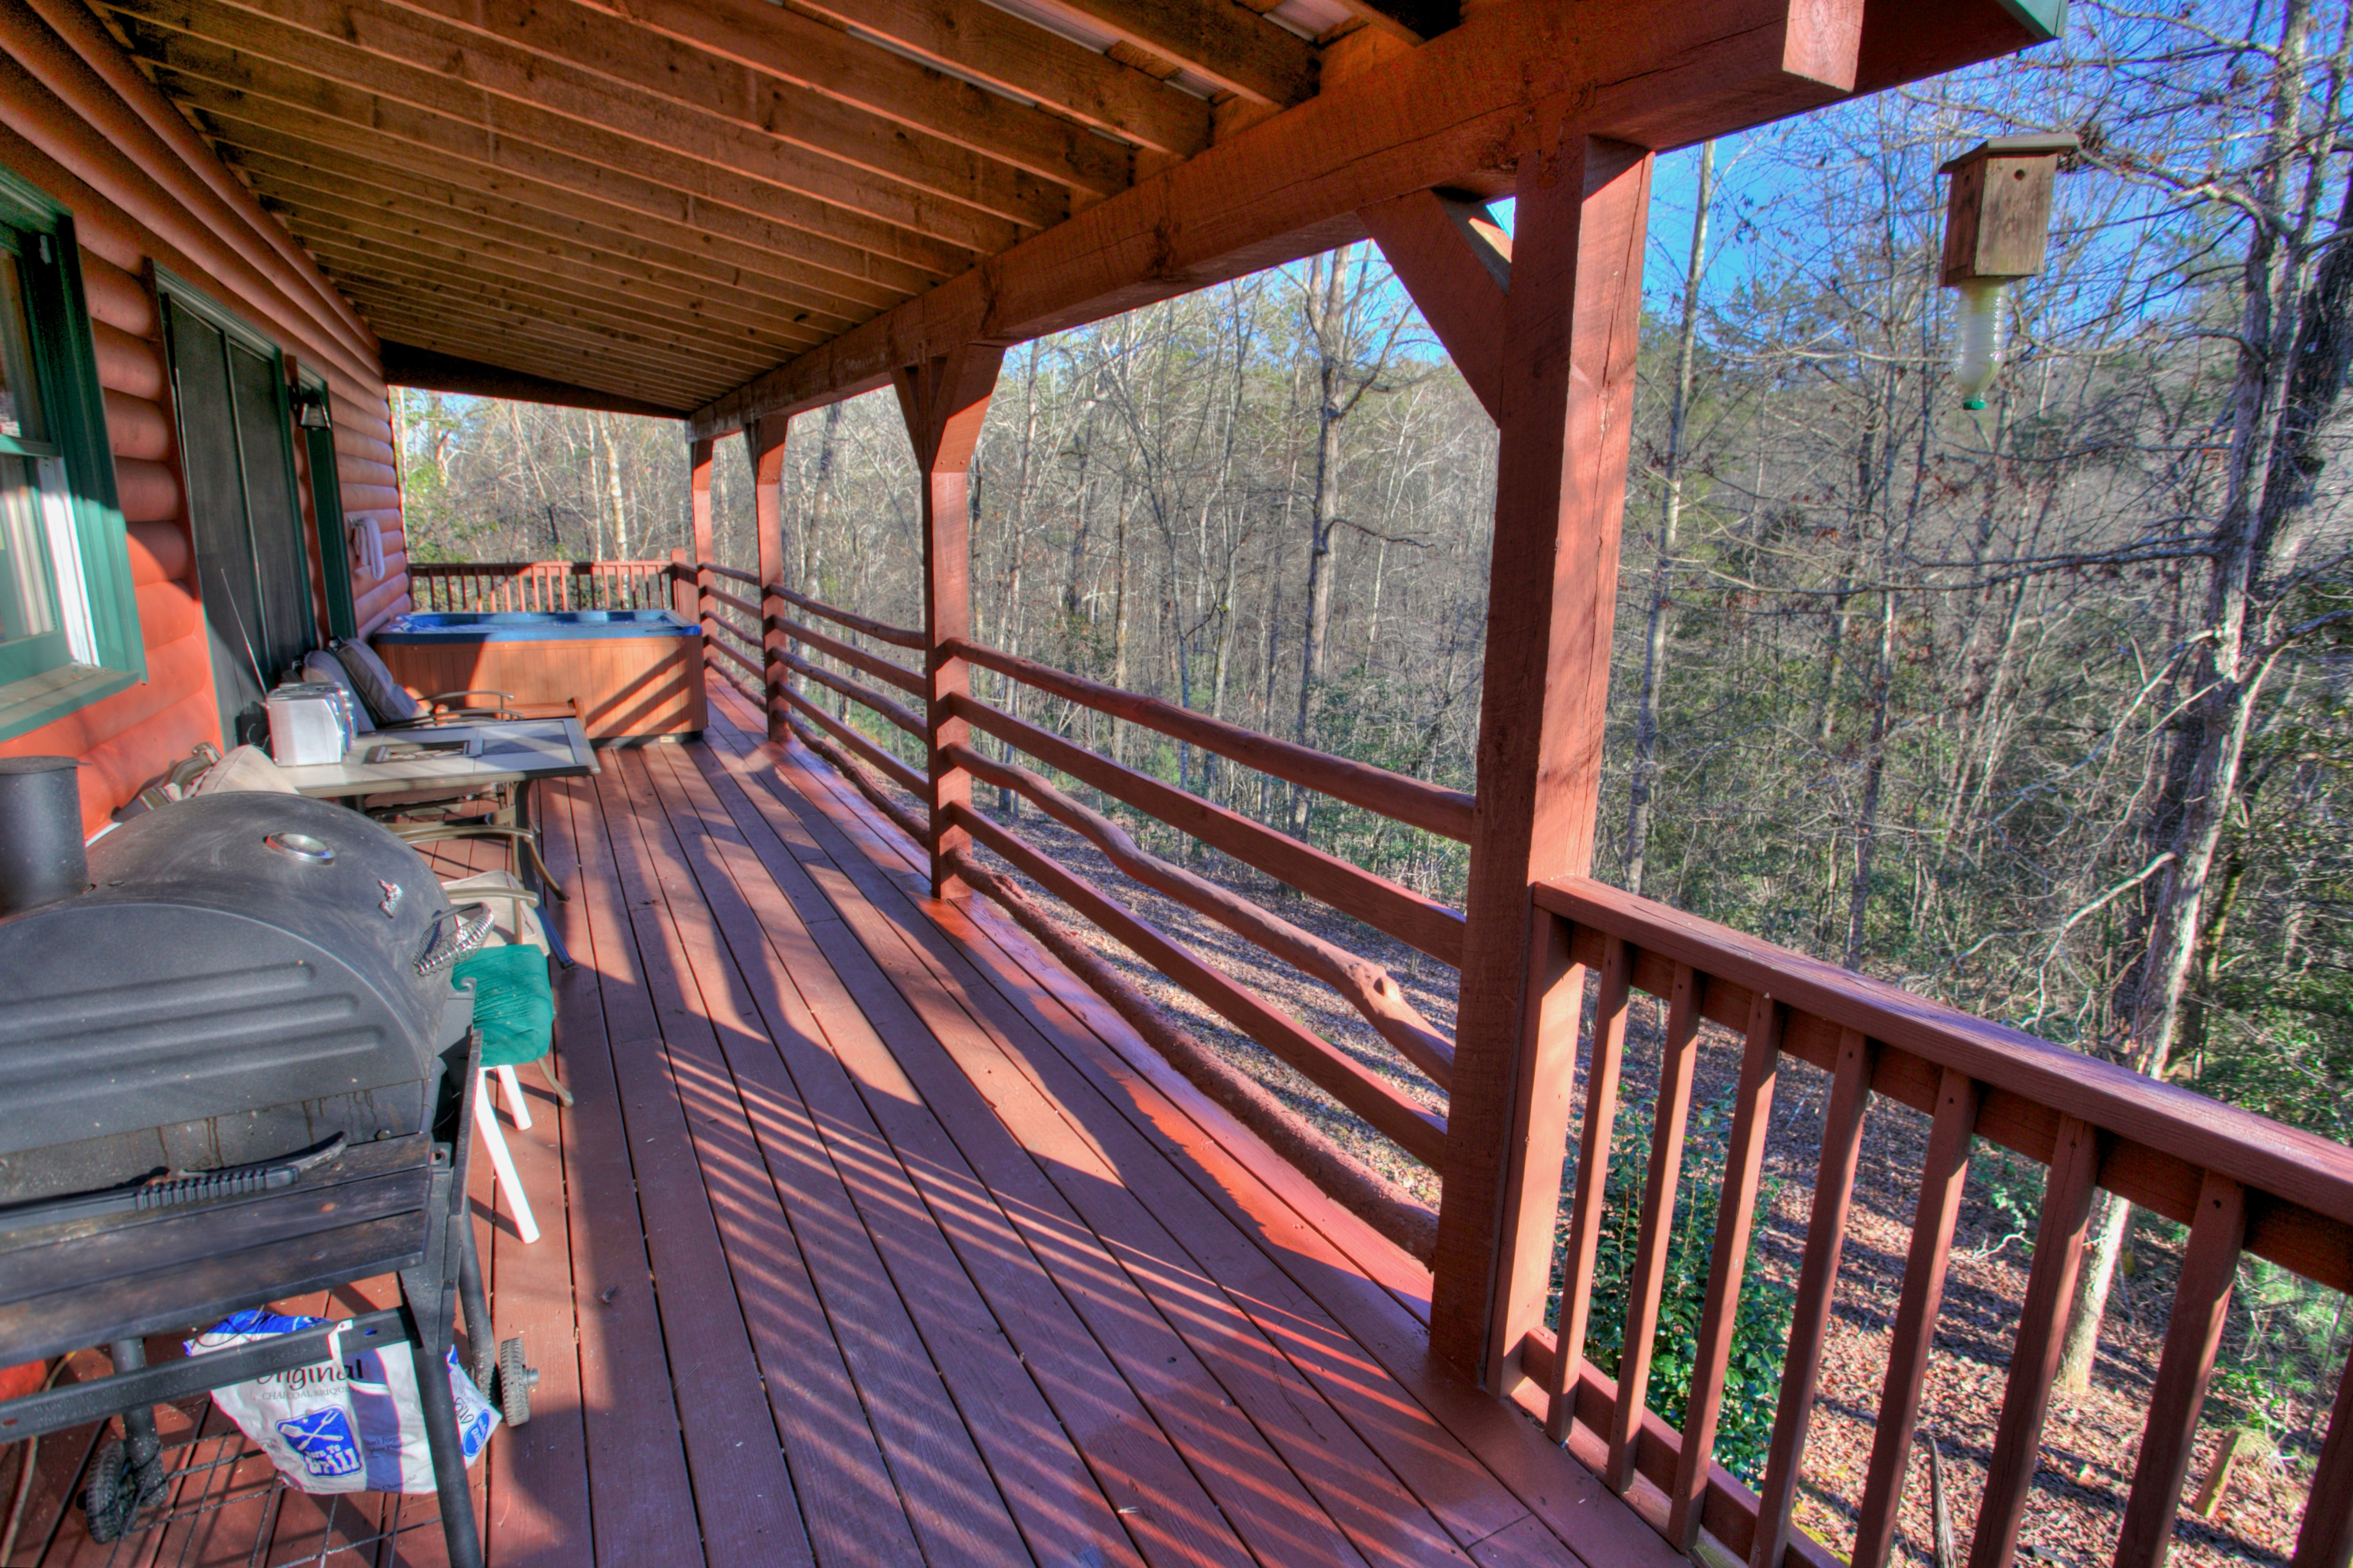 trout-lily-cabin-helen-ga-deck-rentals